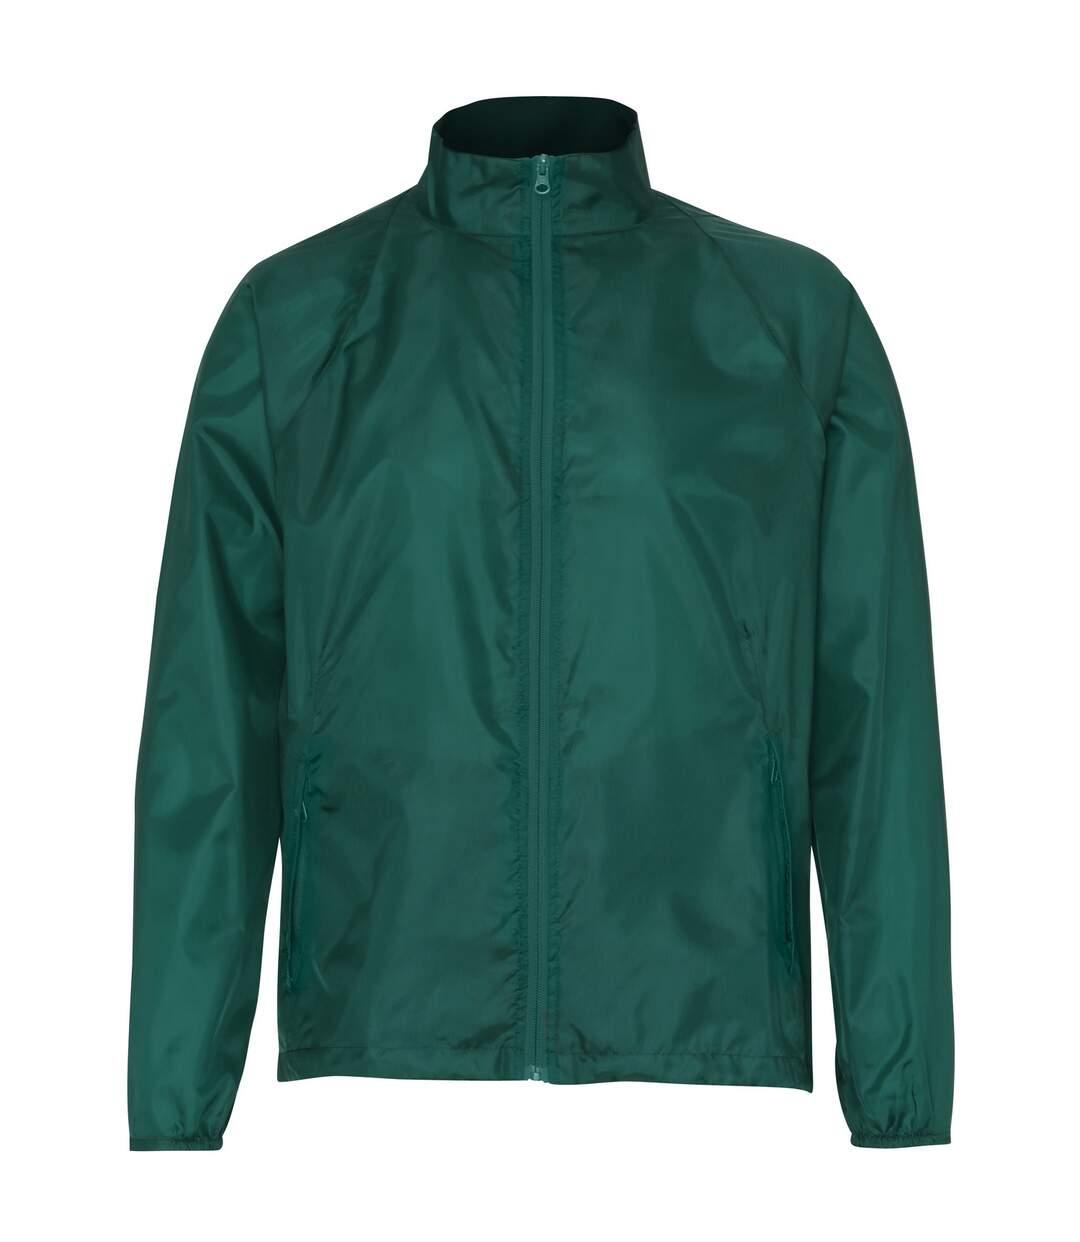 2786 Unisex Lightweight Plain Wind & Shower Resistant Jacket (Bottle) - UTRW2500